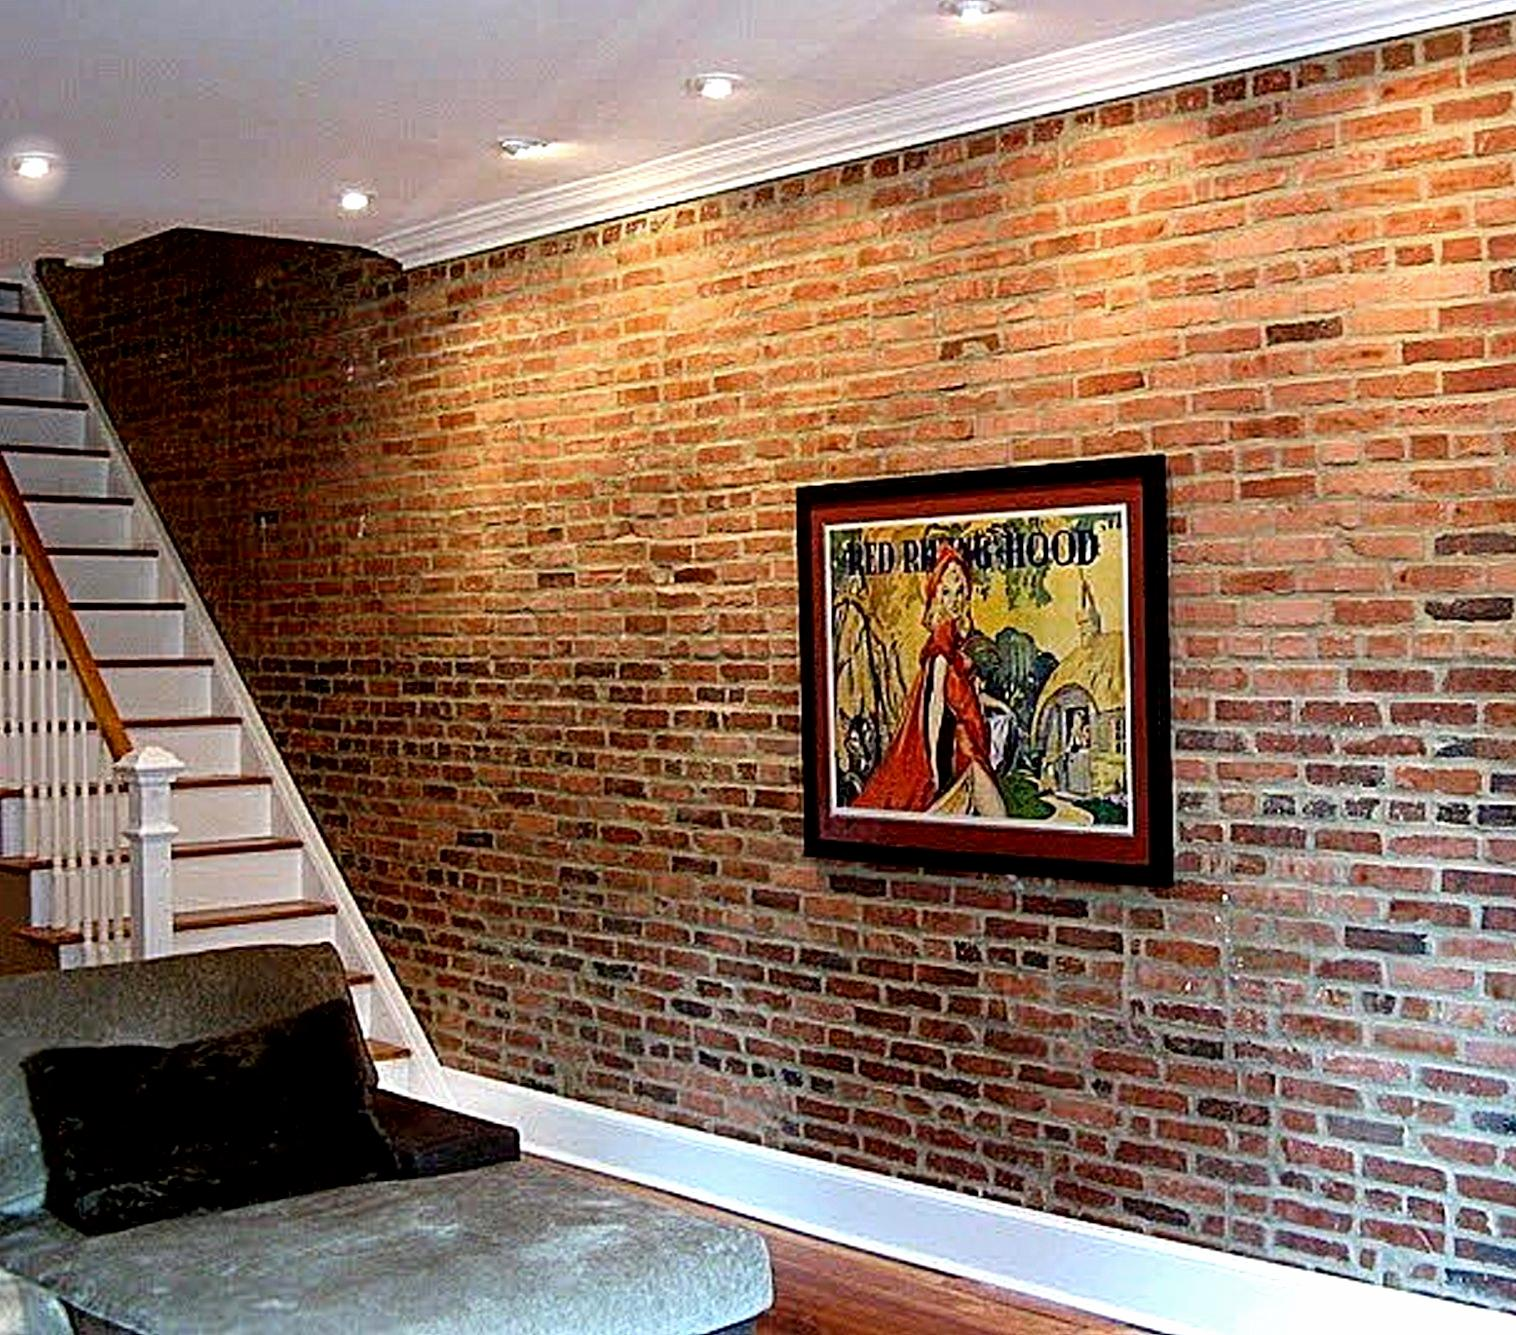 Free Download Faux Brick Panel A Stylish Finish 1516x1335 For Your Desktop Mobile Tablet Explore 49 Faux Brick Wallpaper Lowes Faux Brick Wallpaper Lowes Faux Brick Wallpaper At Lowe S